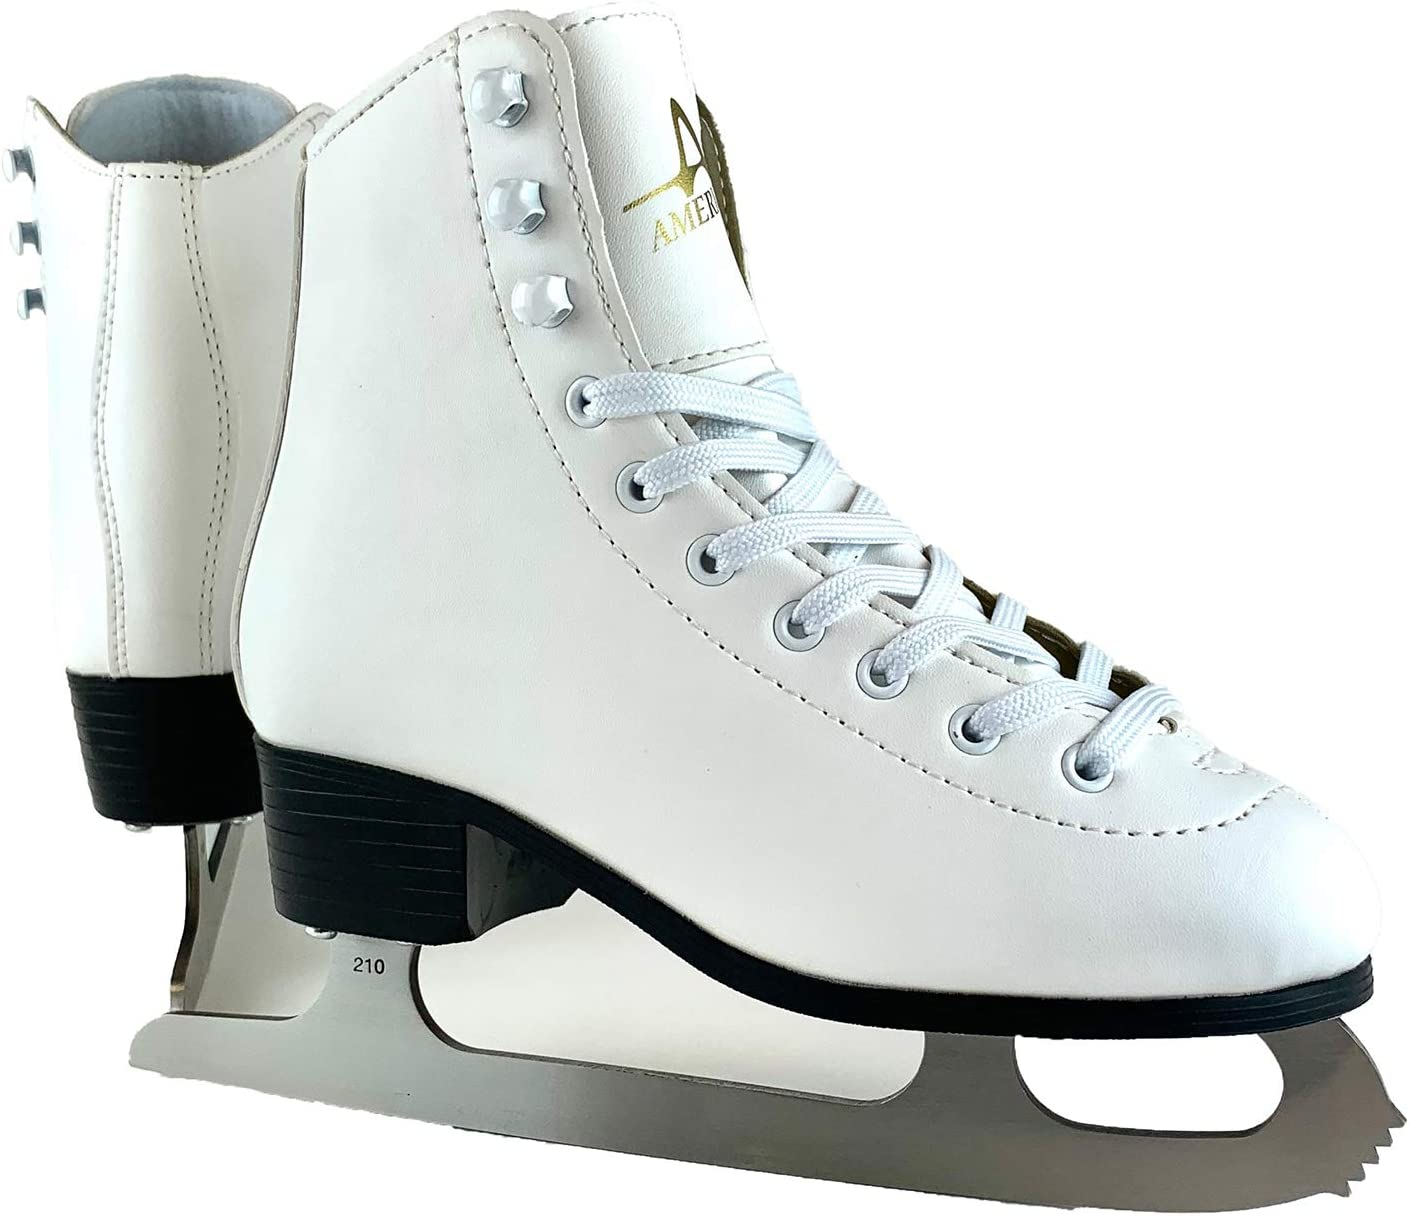 Lake Placid Nitro Adjustable Ice Skates